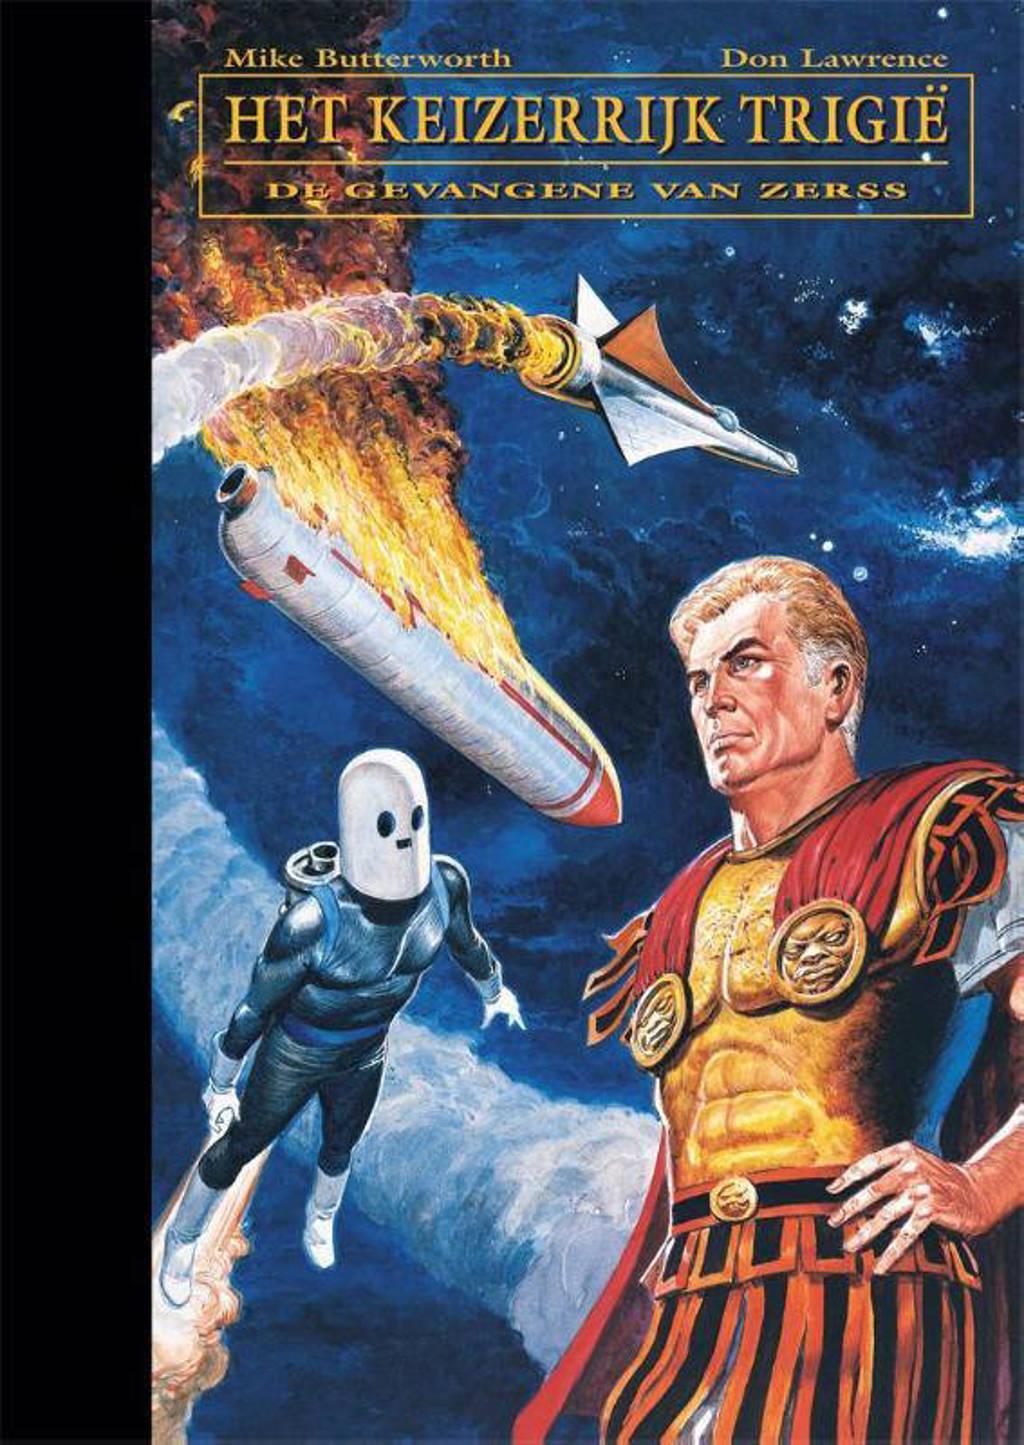 Keizerrijk Trigië collectie - Don Lawrence en Mike Butterworth